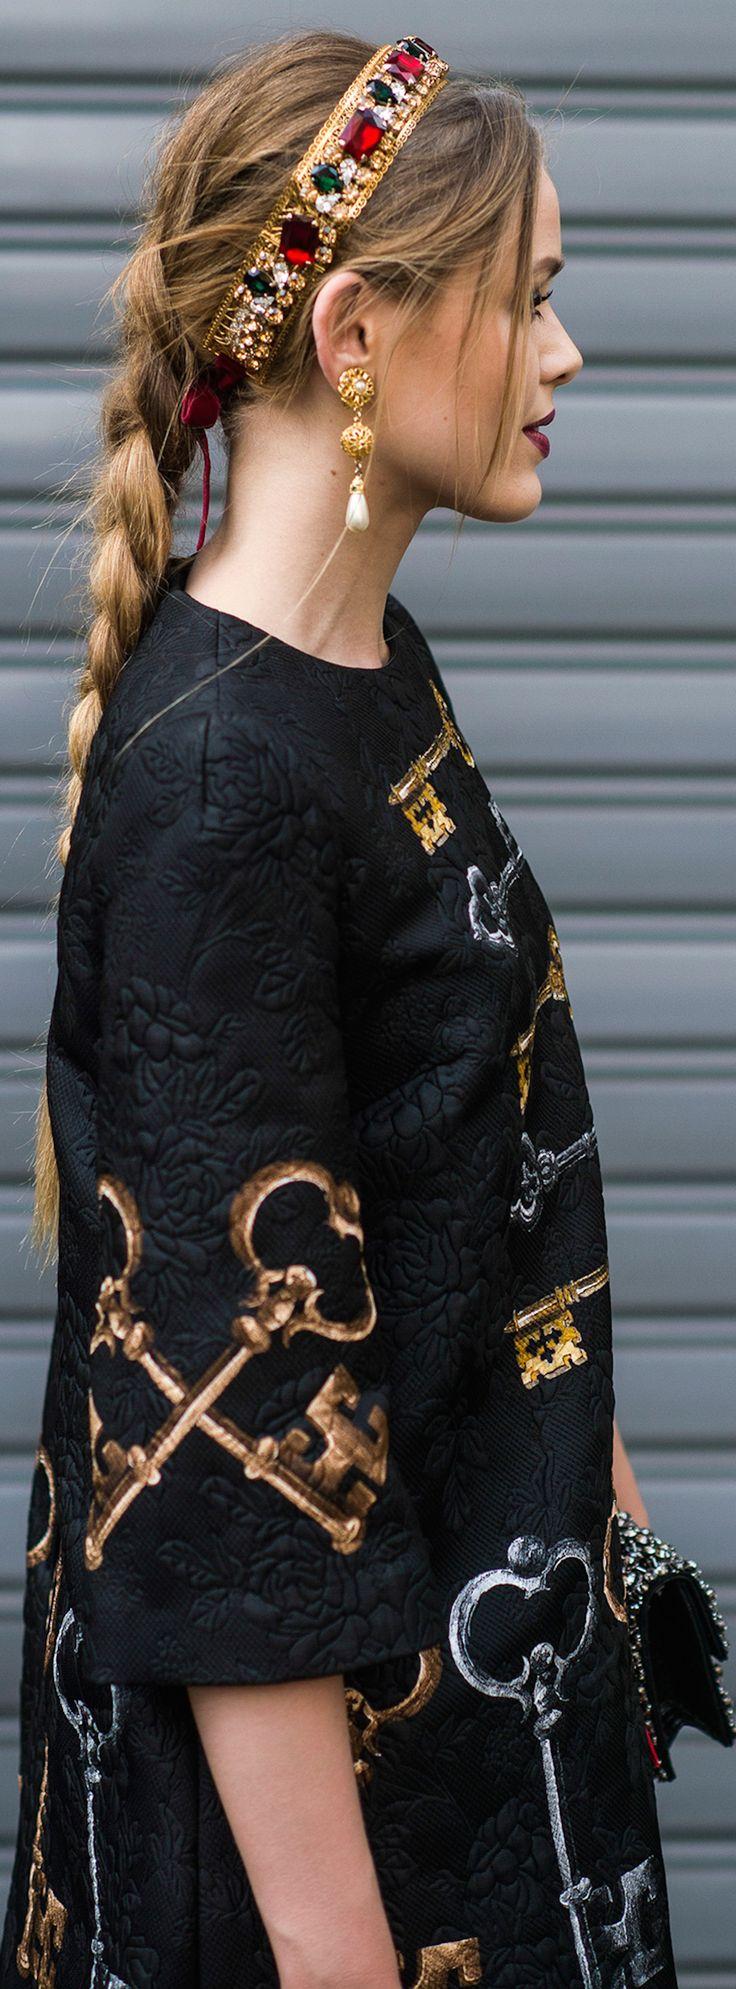 Dolce & Gabbana #Hair #HairJewellery #hairstyle